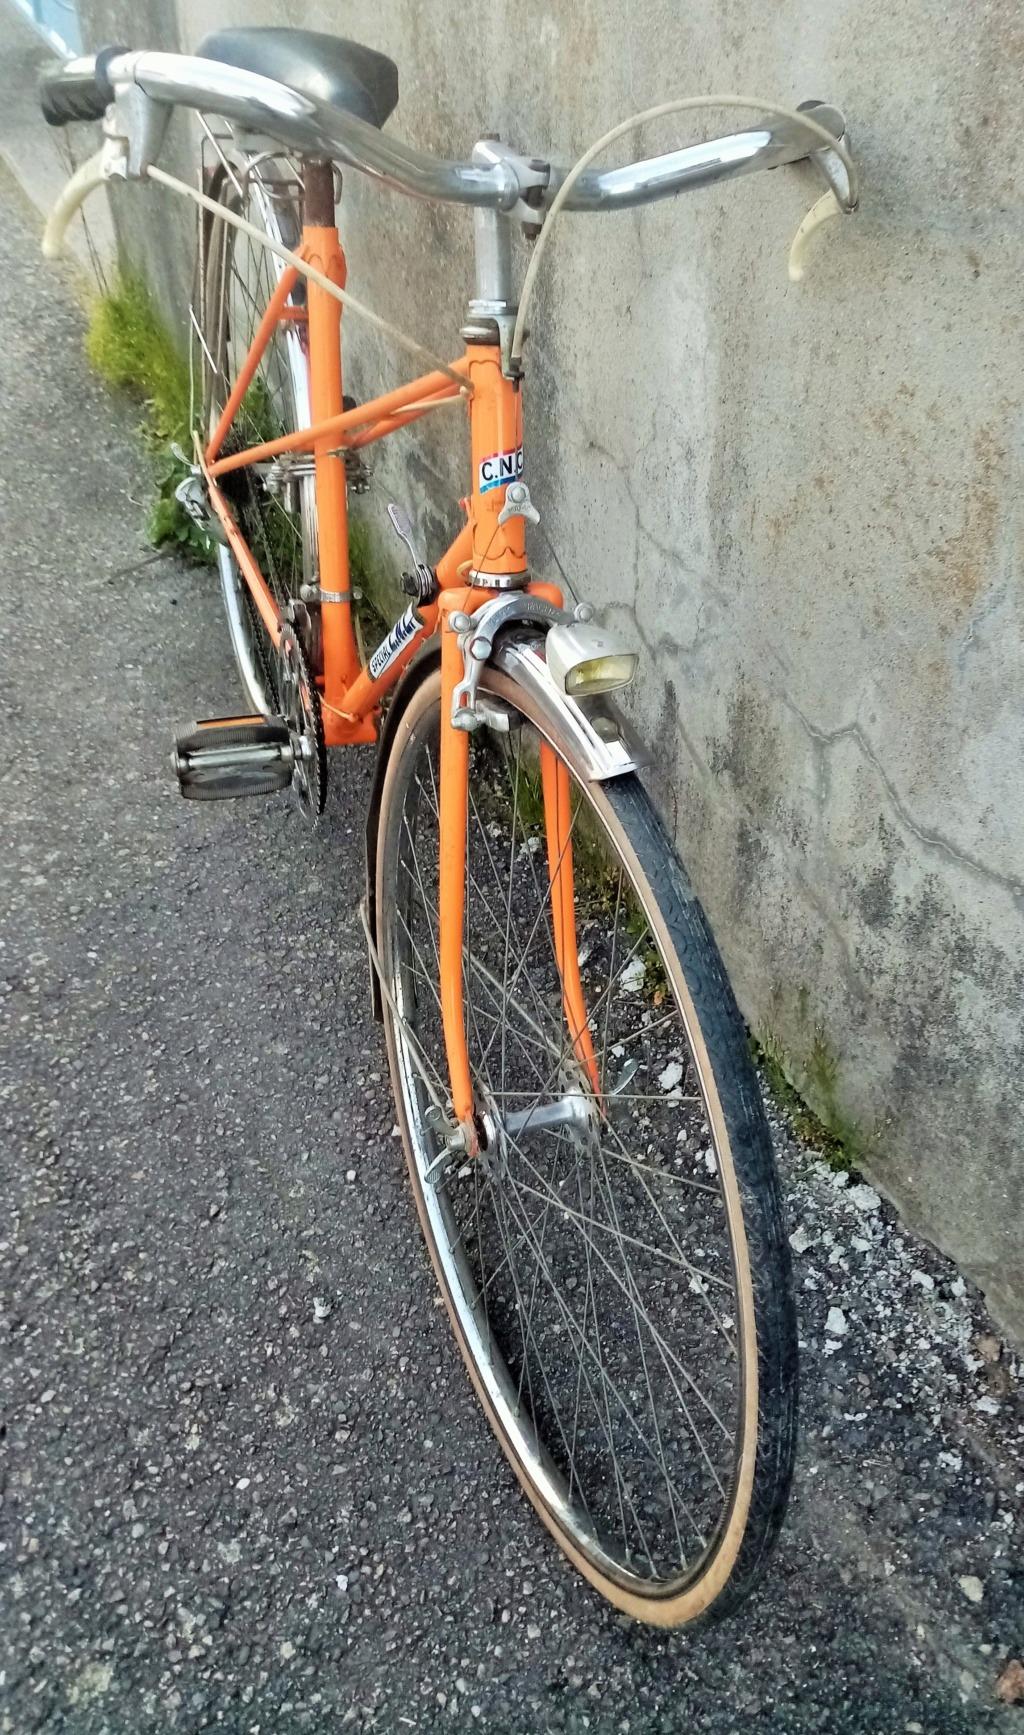 1/2 course dame SPECIAL CNC 1978 orange 01434